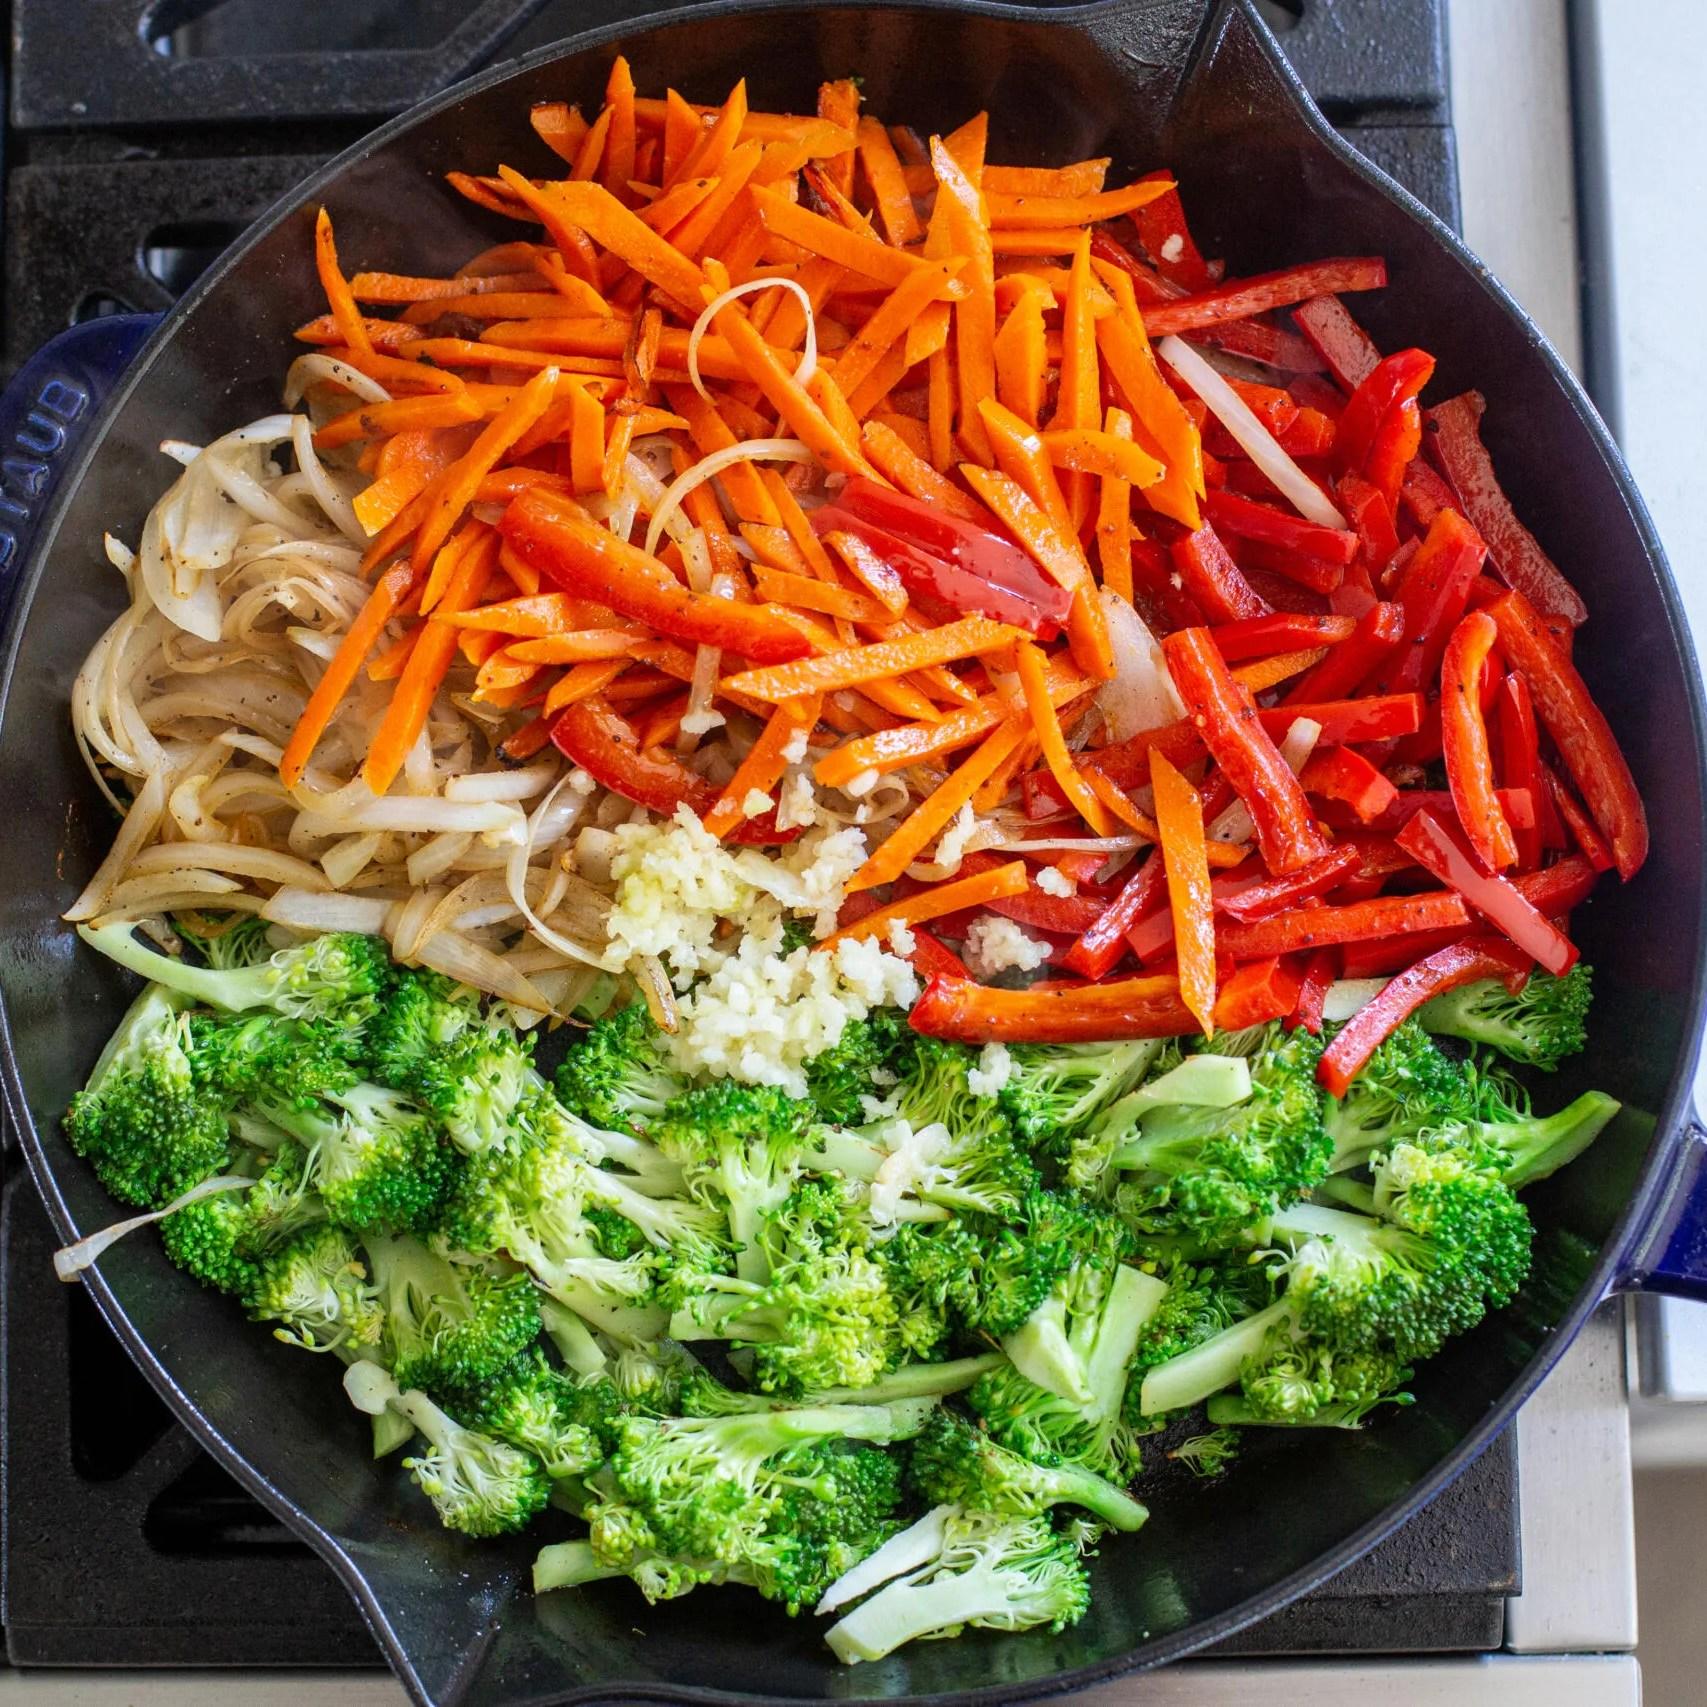 Veggies in a frying pan